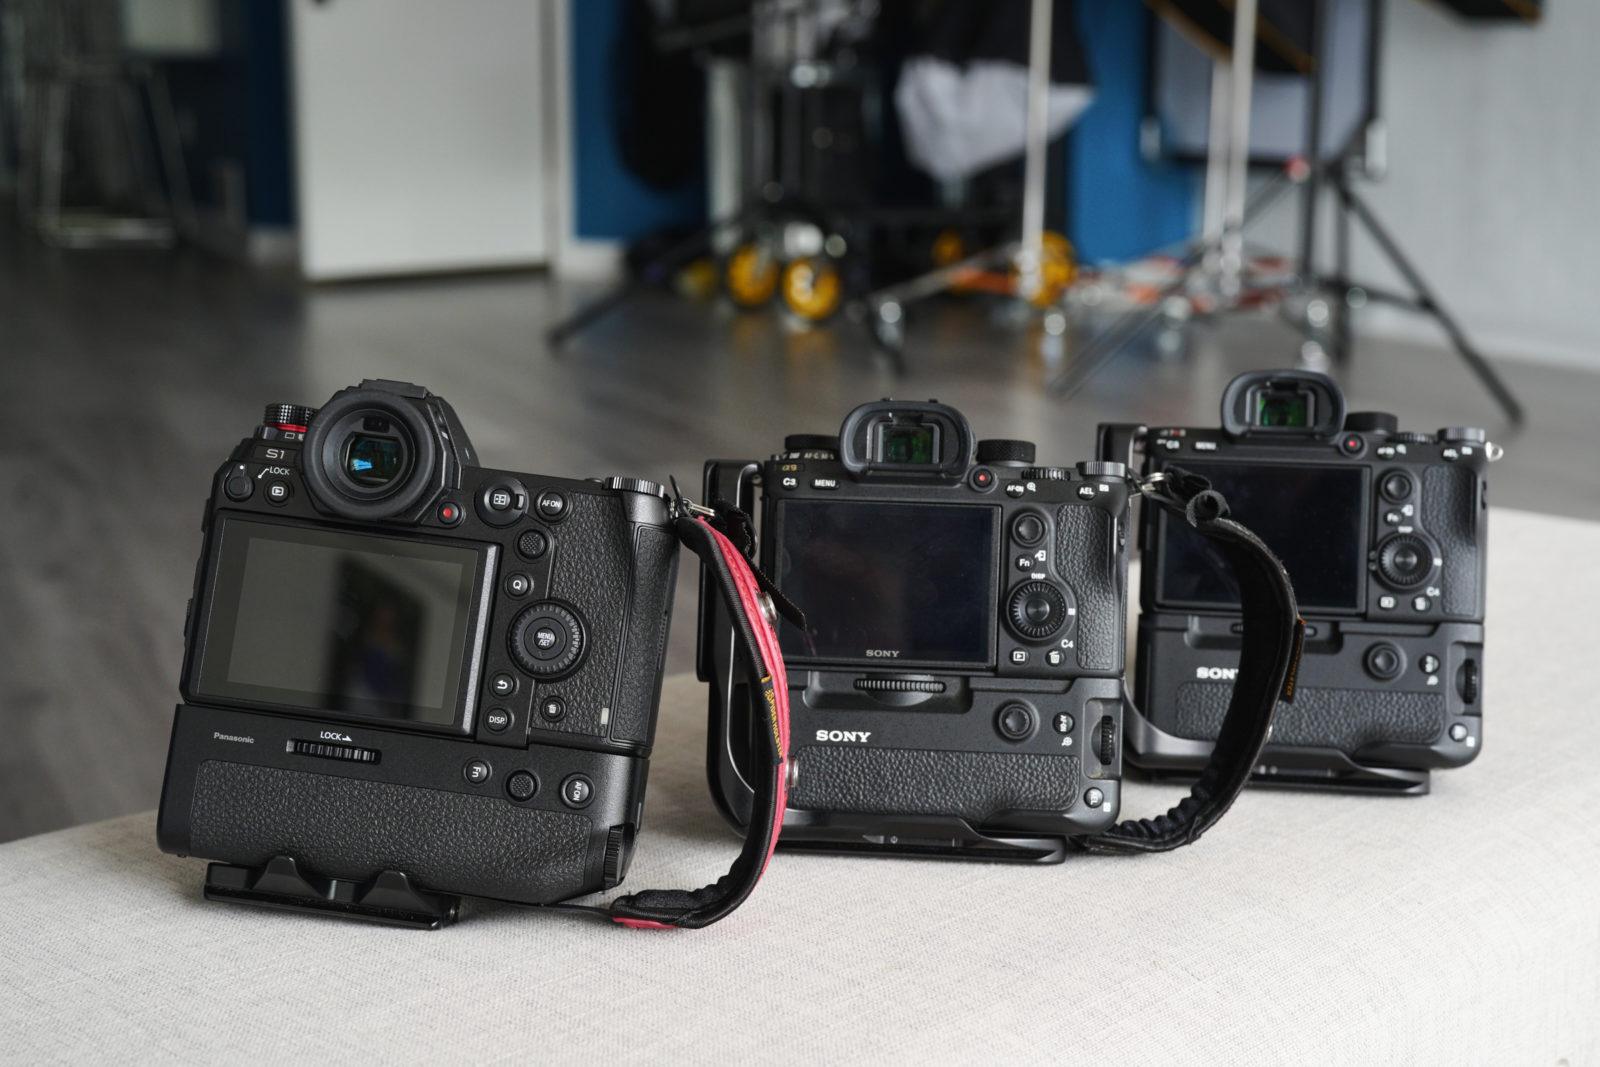 Panasonic Lumix S1, Sony A9, Sony A7R III